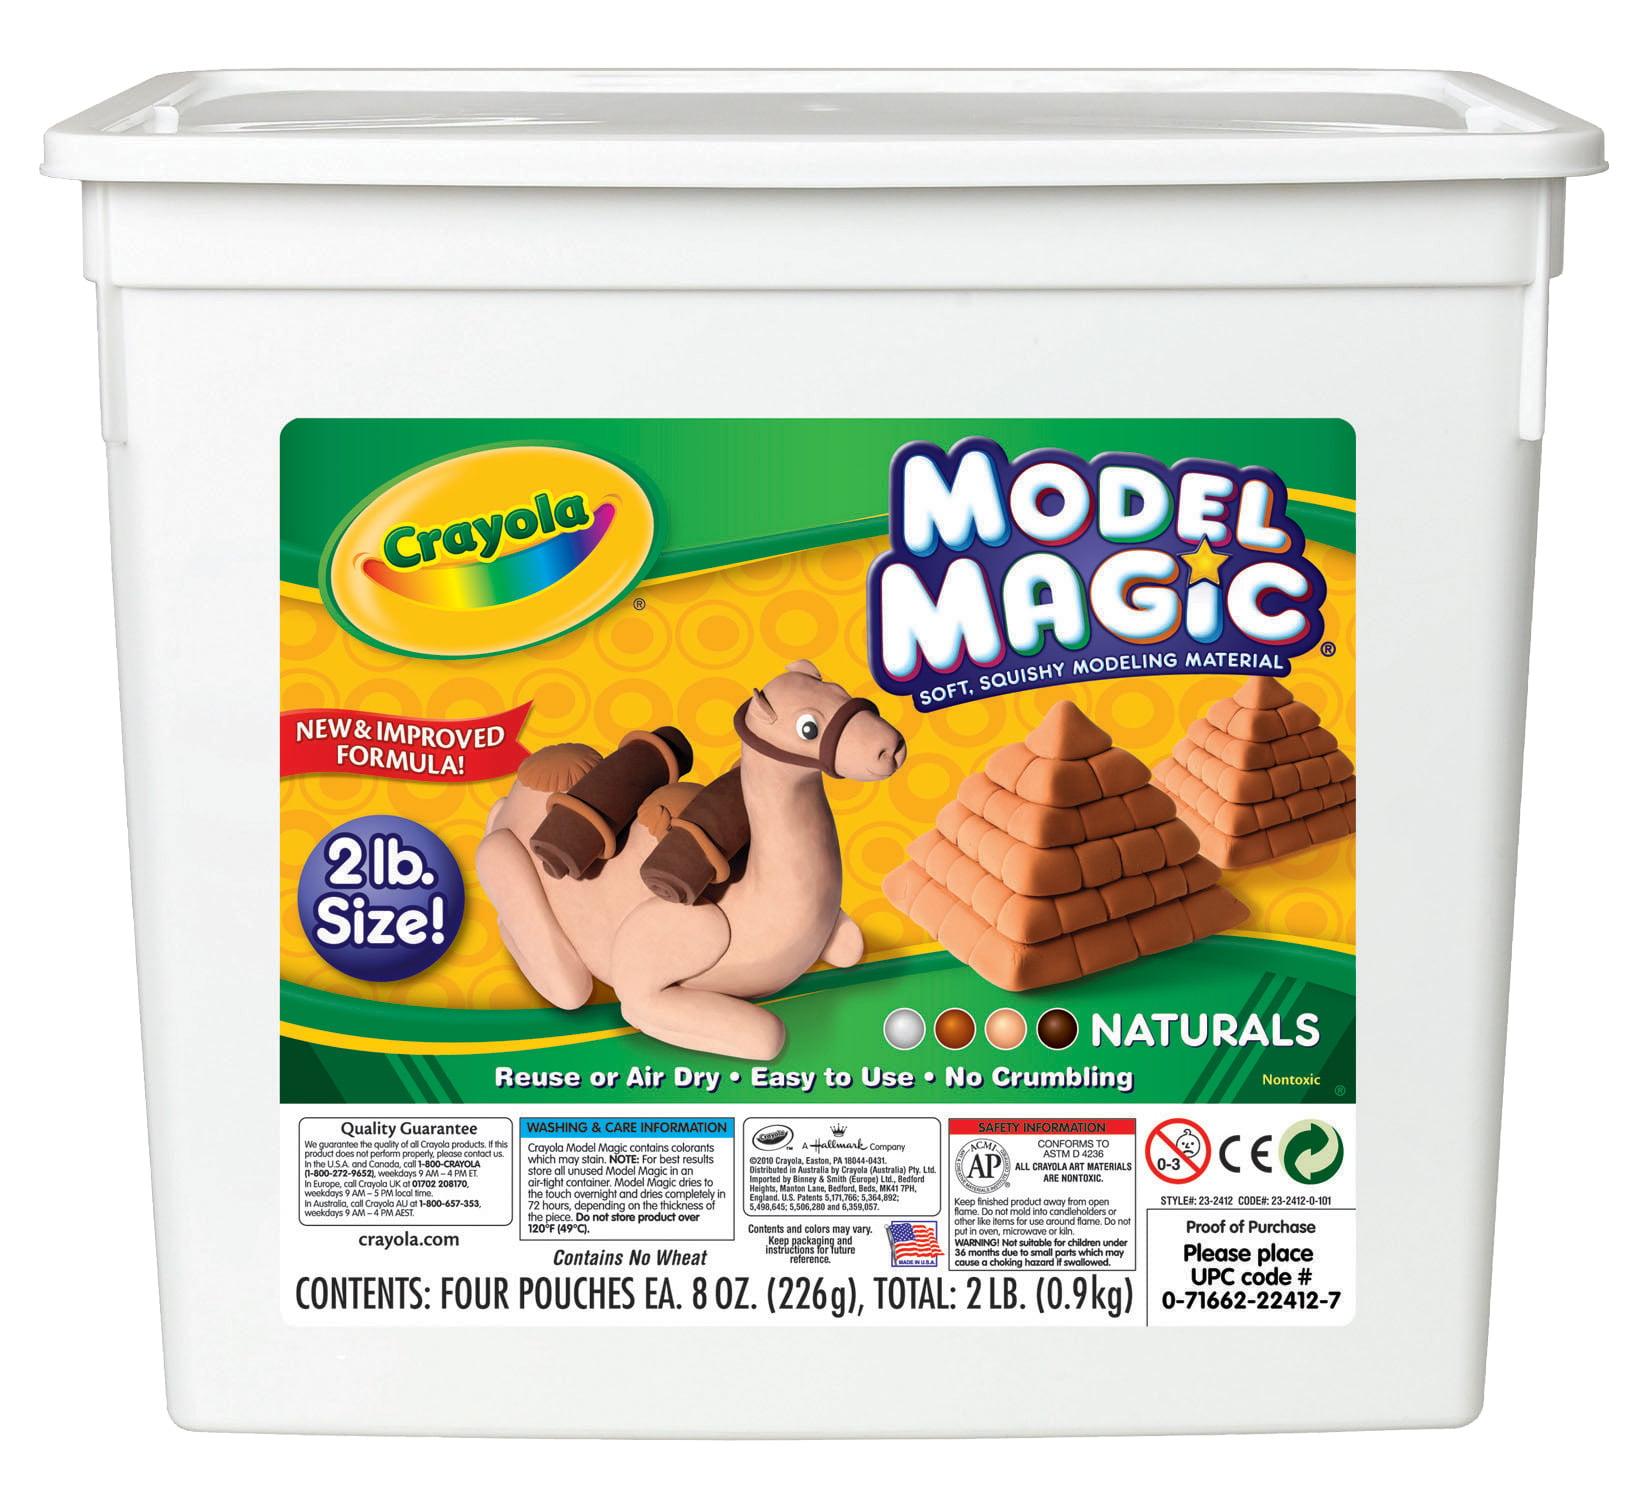 Crayola Model Magic Non-Toxic Modeling Dough Set, 8 oz, Assorted Natural Color, Set of 4 by Crayola LLC